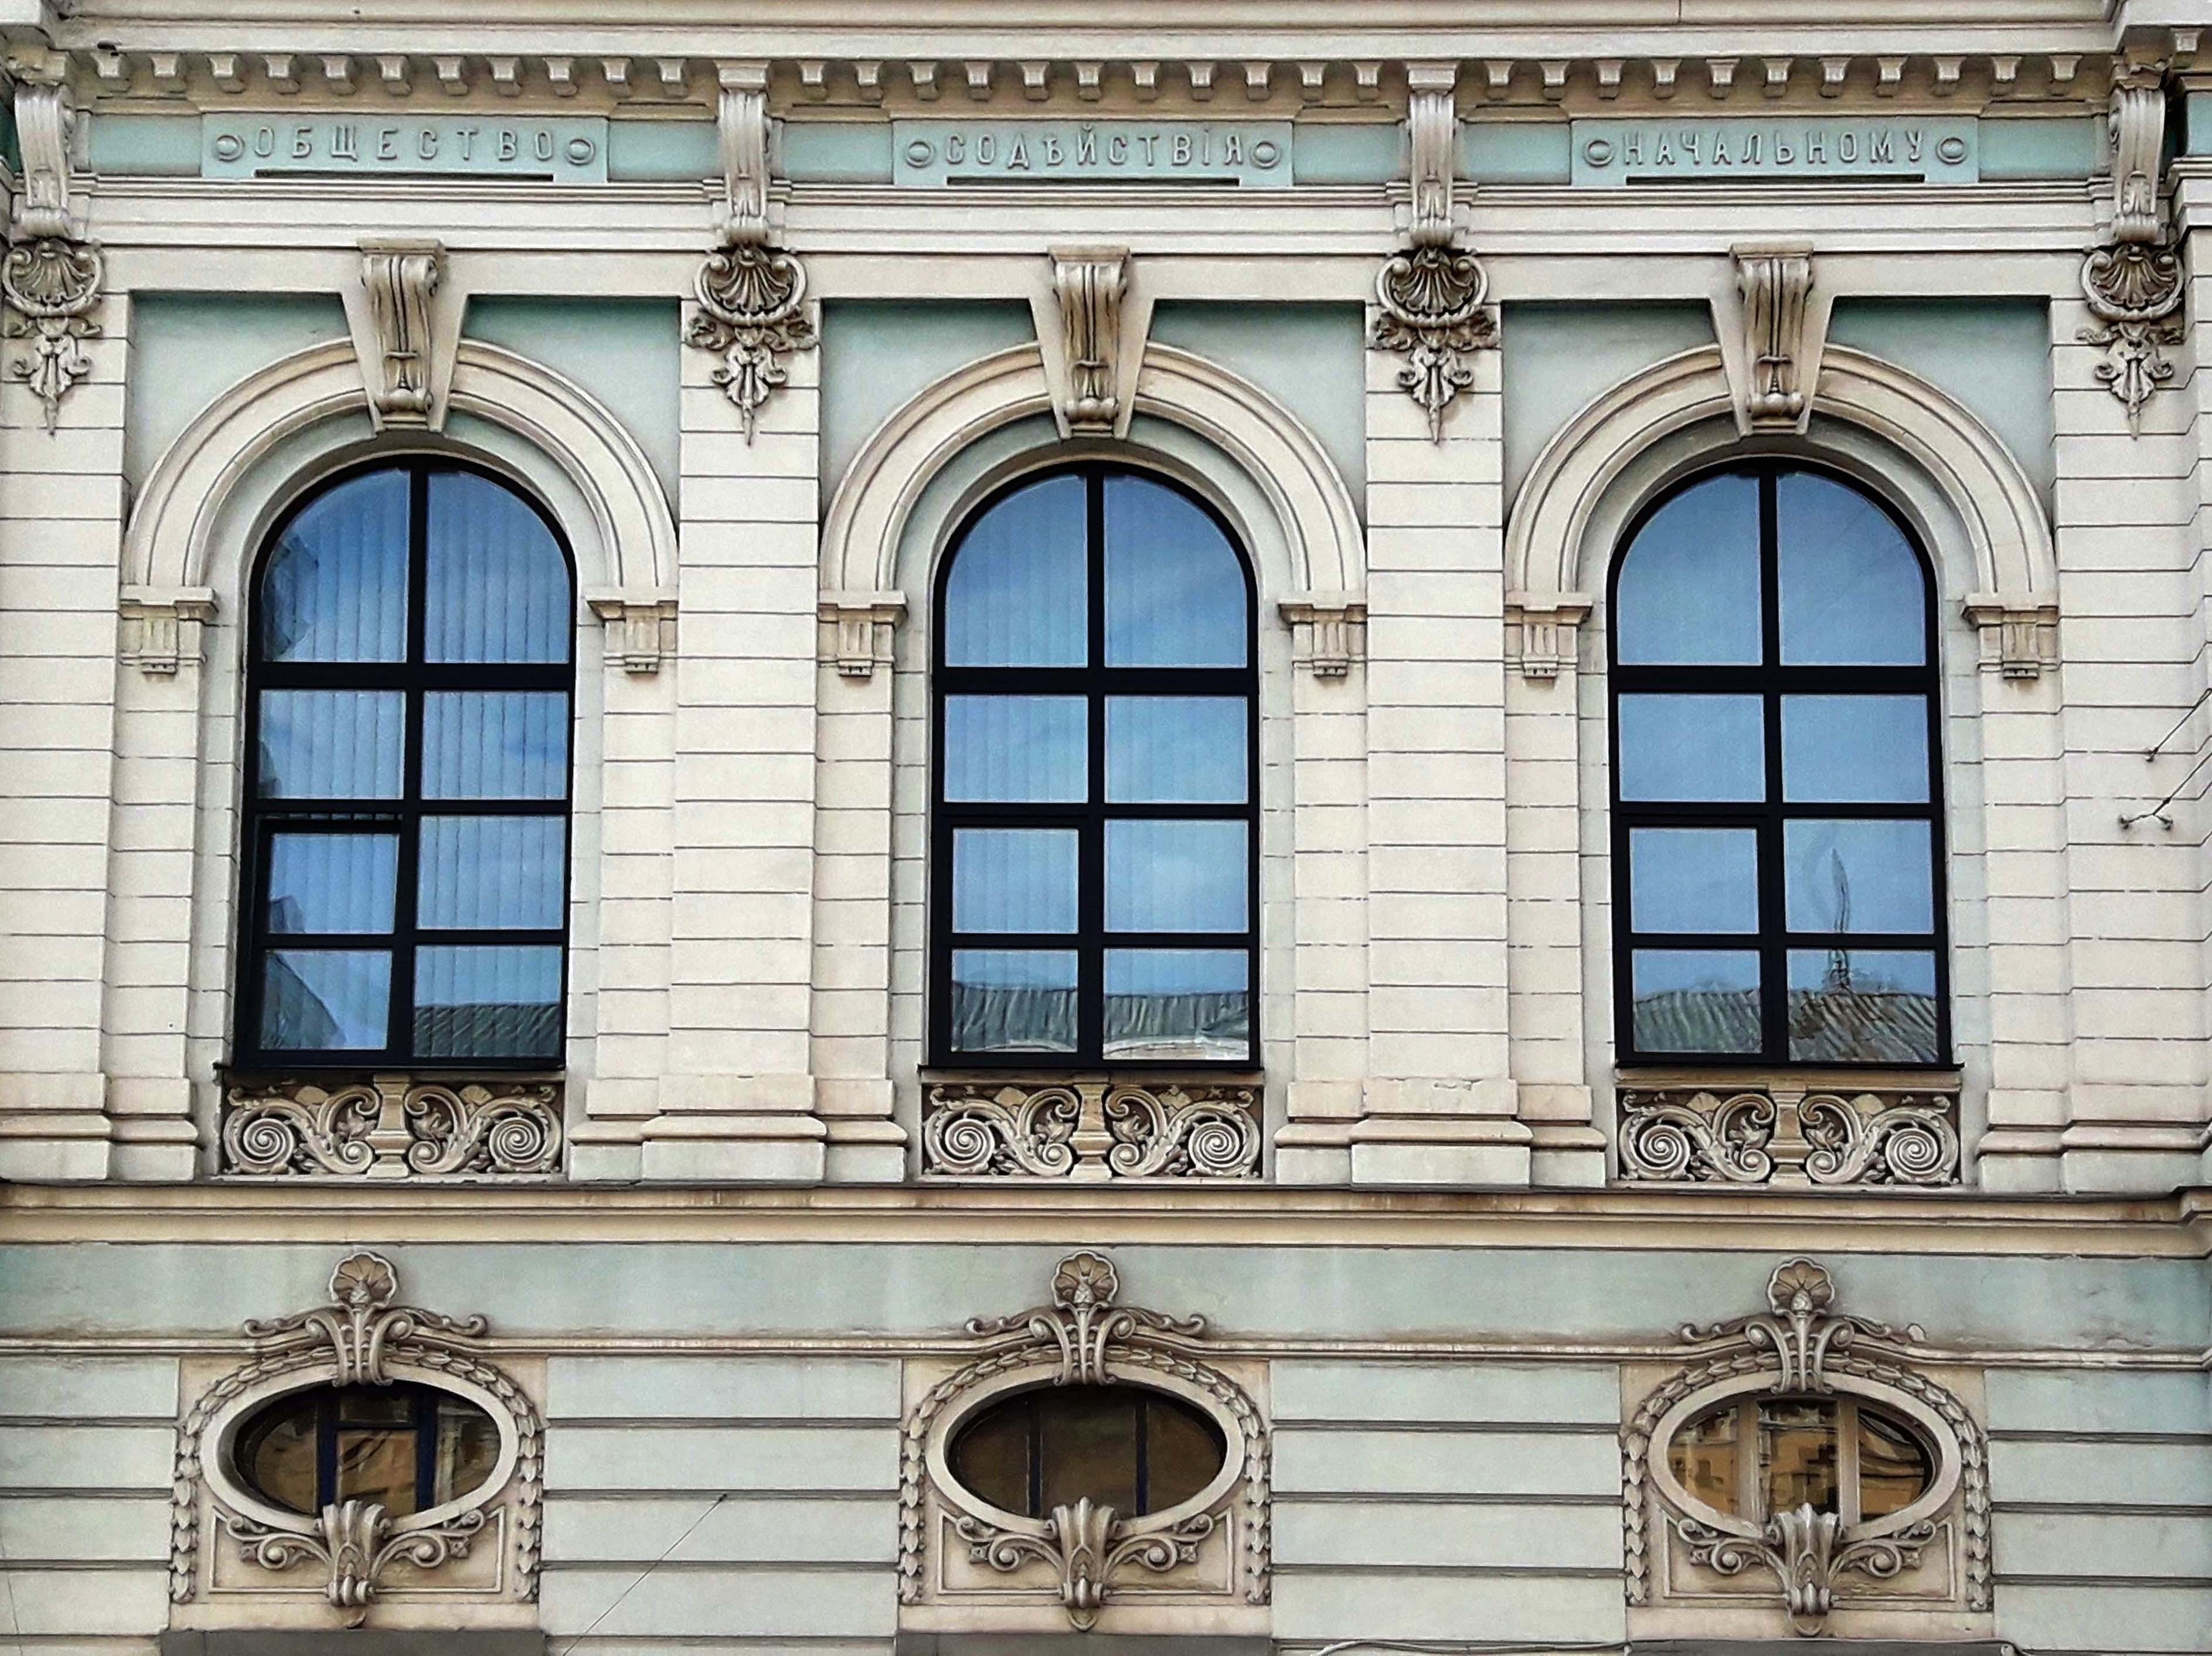 московская46_дом1808.jpg